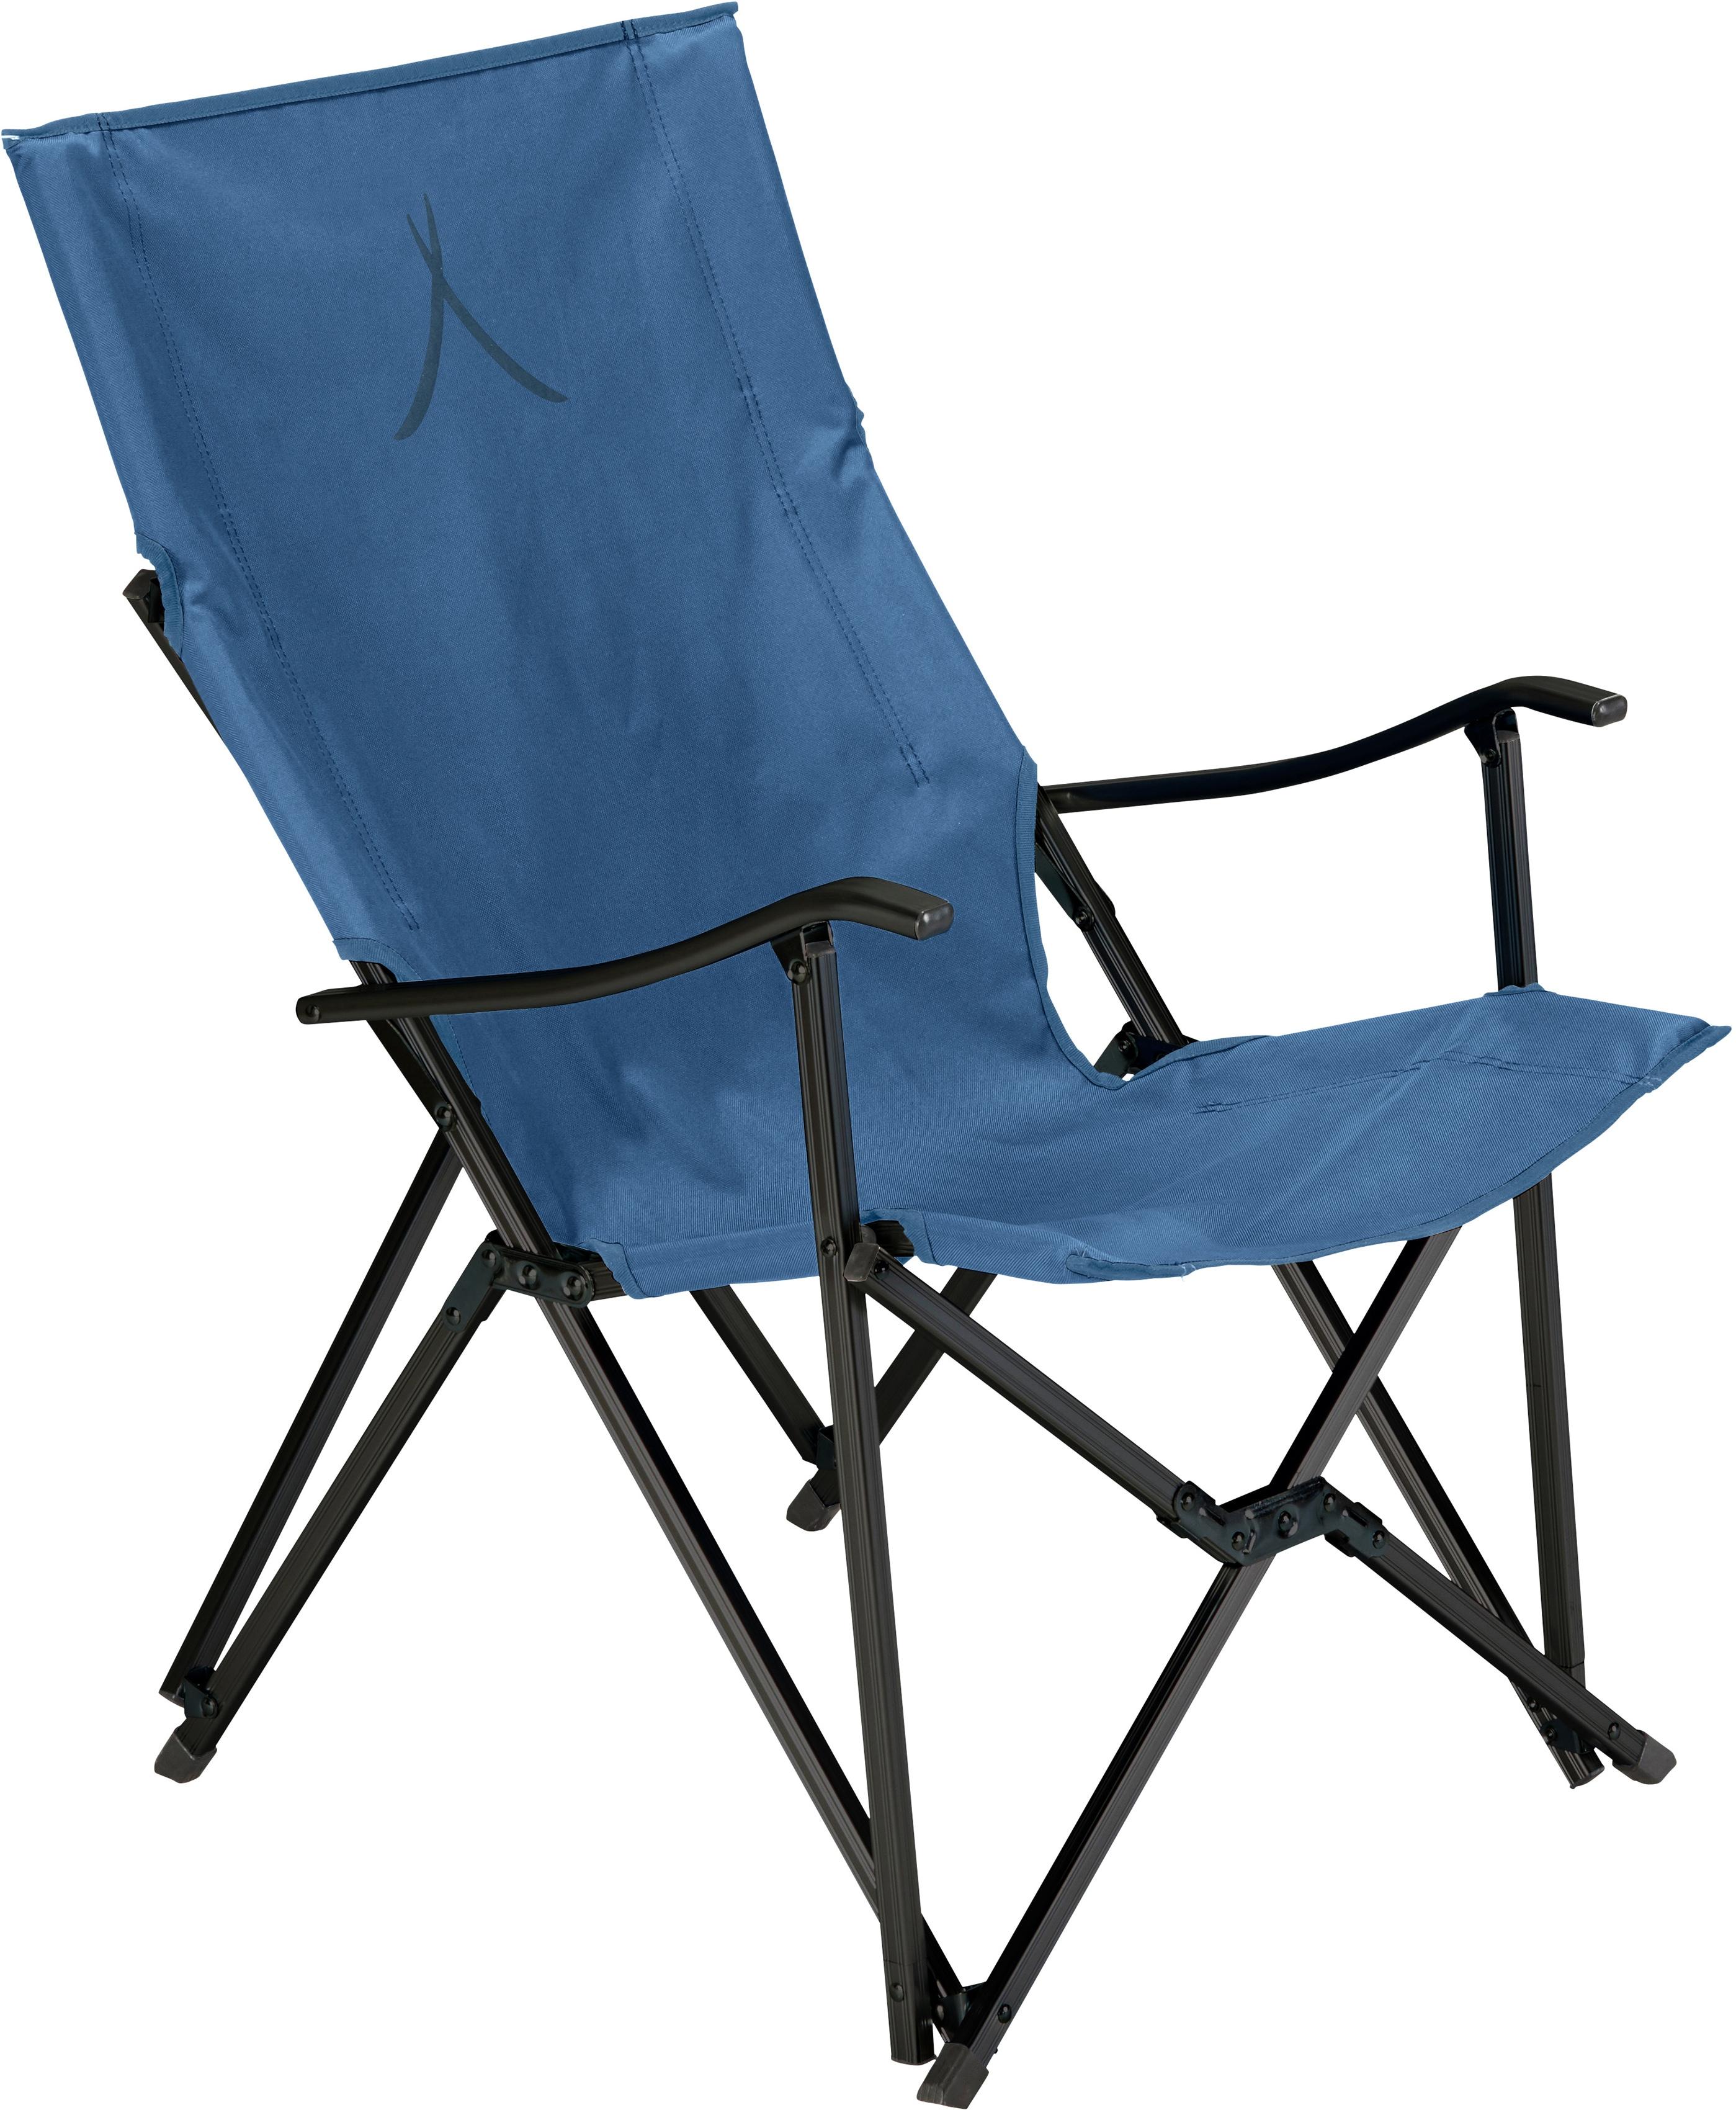 GRAND CANYON Campingstuhl EL TOVAR blau Campingmöbel Camping Schlafen Outdoor